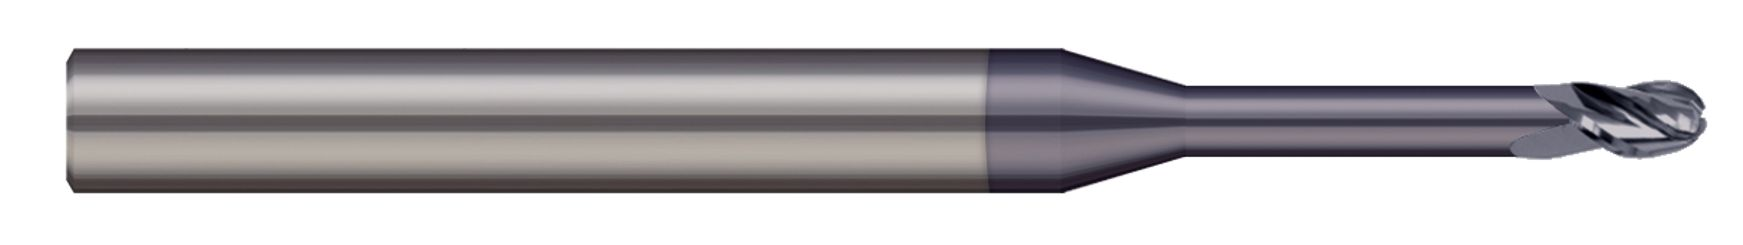 End Mills for Steels & High Temperature Alloys - Ball - 2 & 3 Flute - Long Reach, Stub Flute